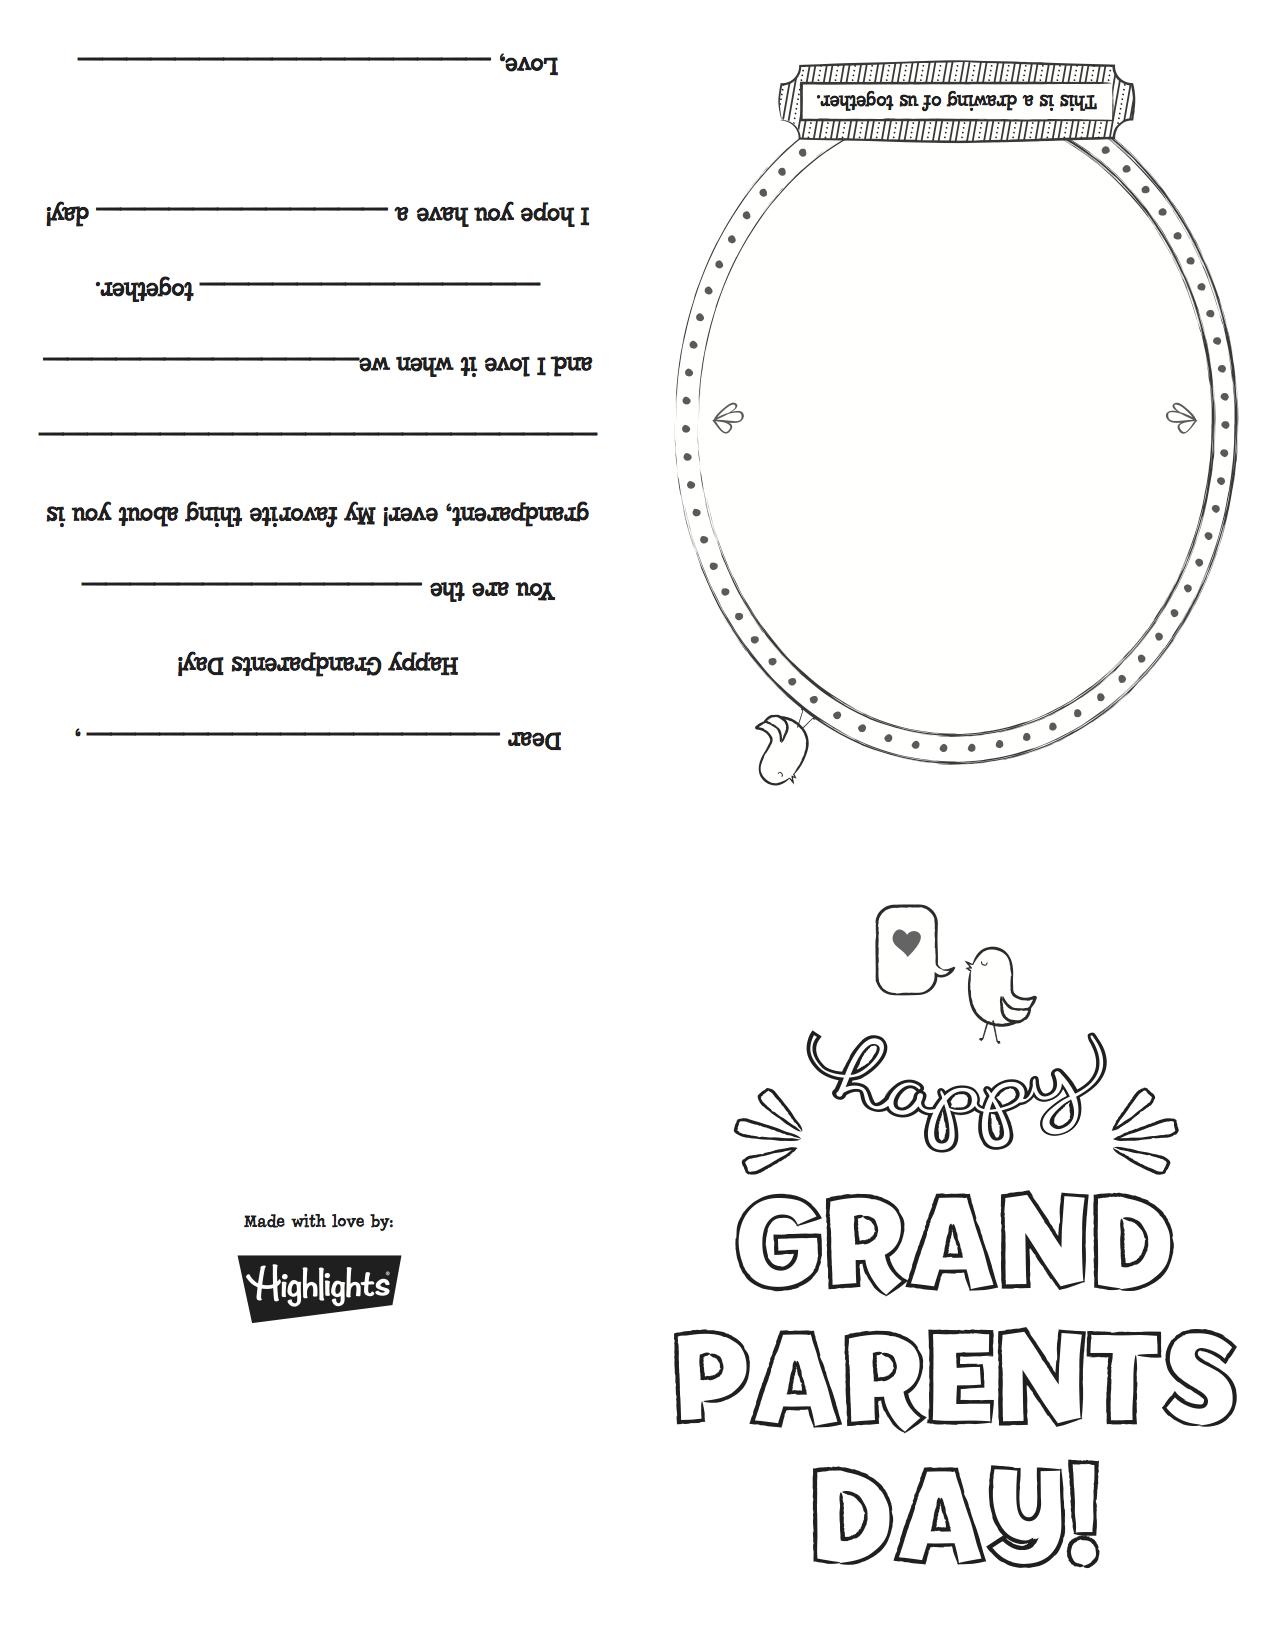 Grandparentsdaycard Copy